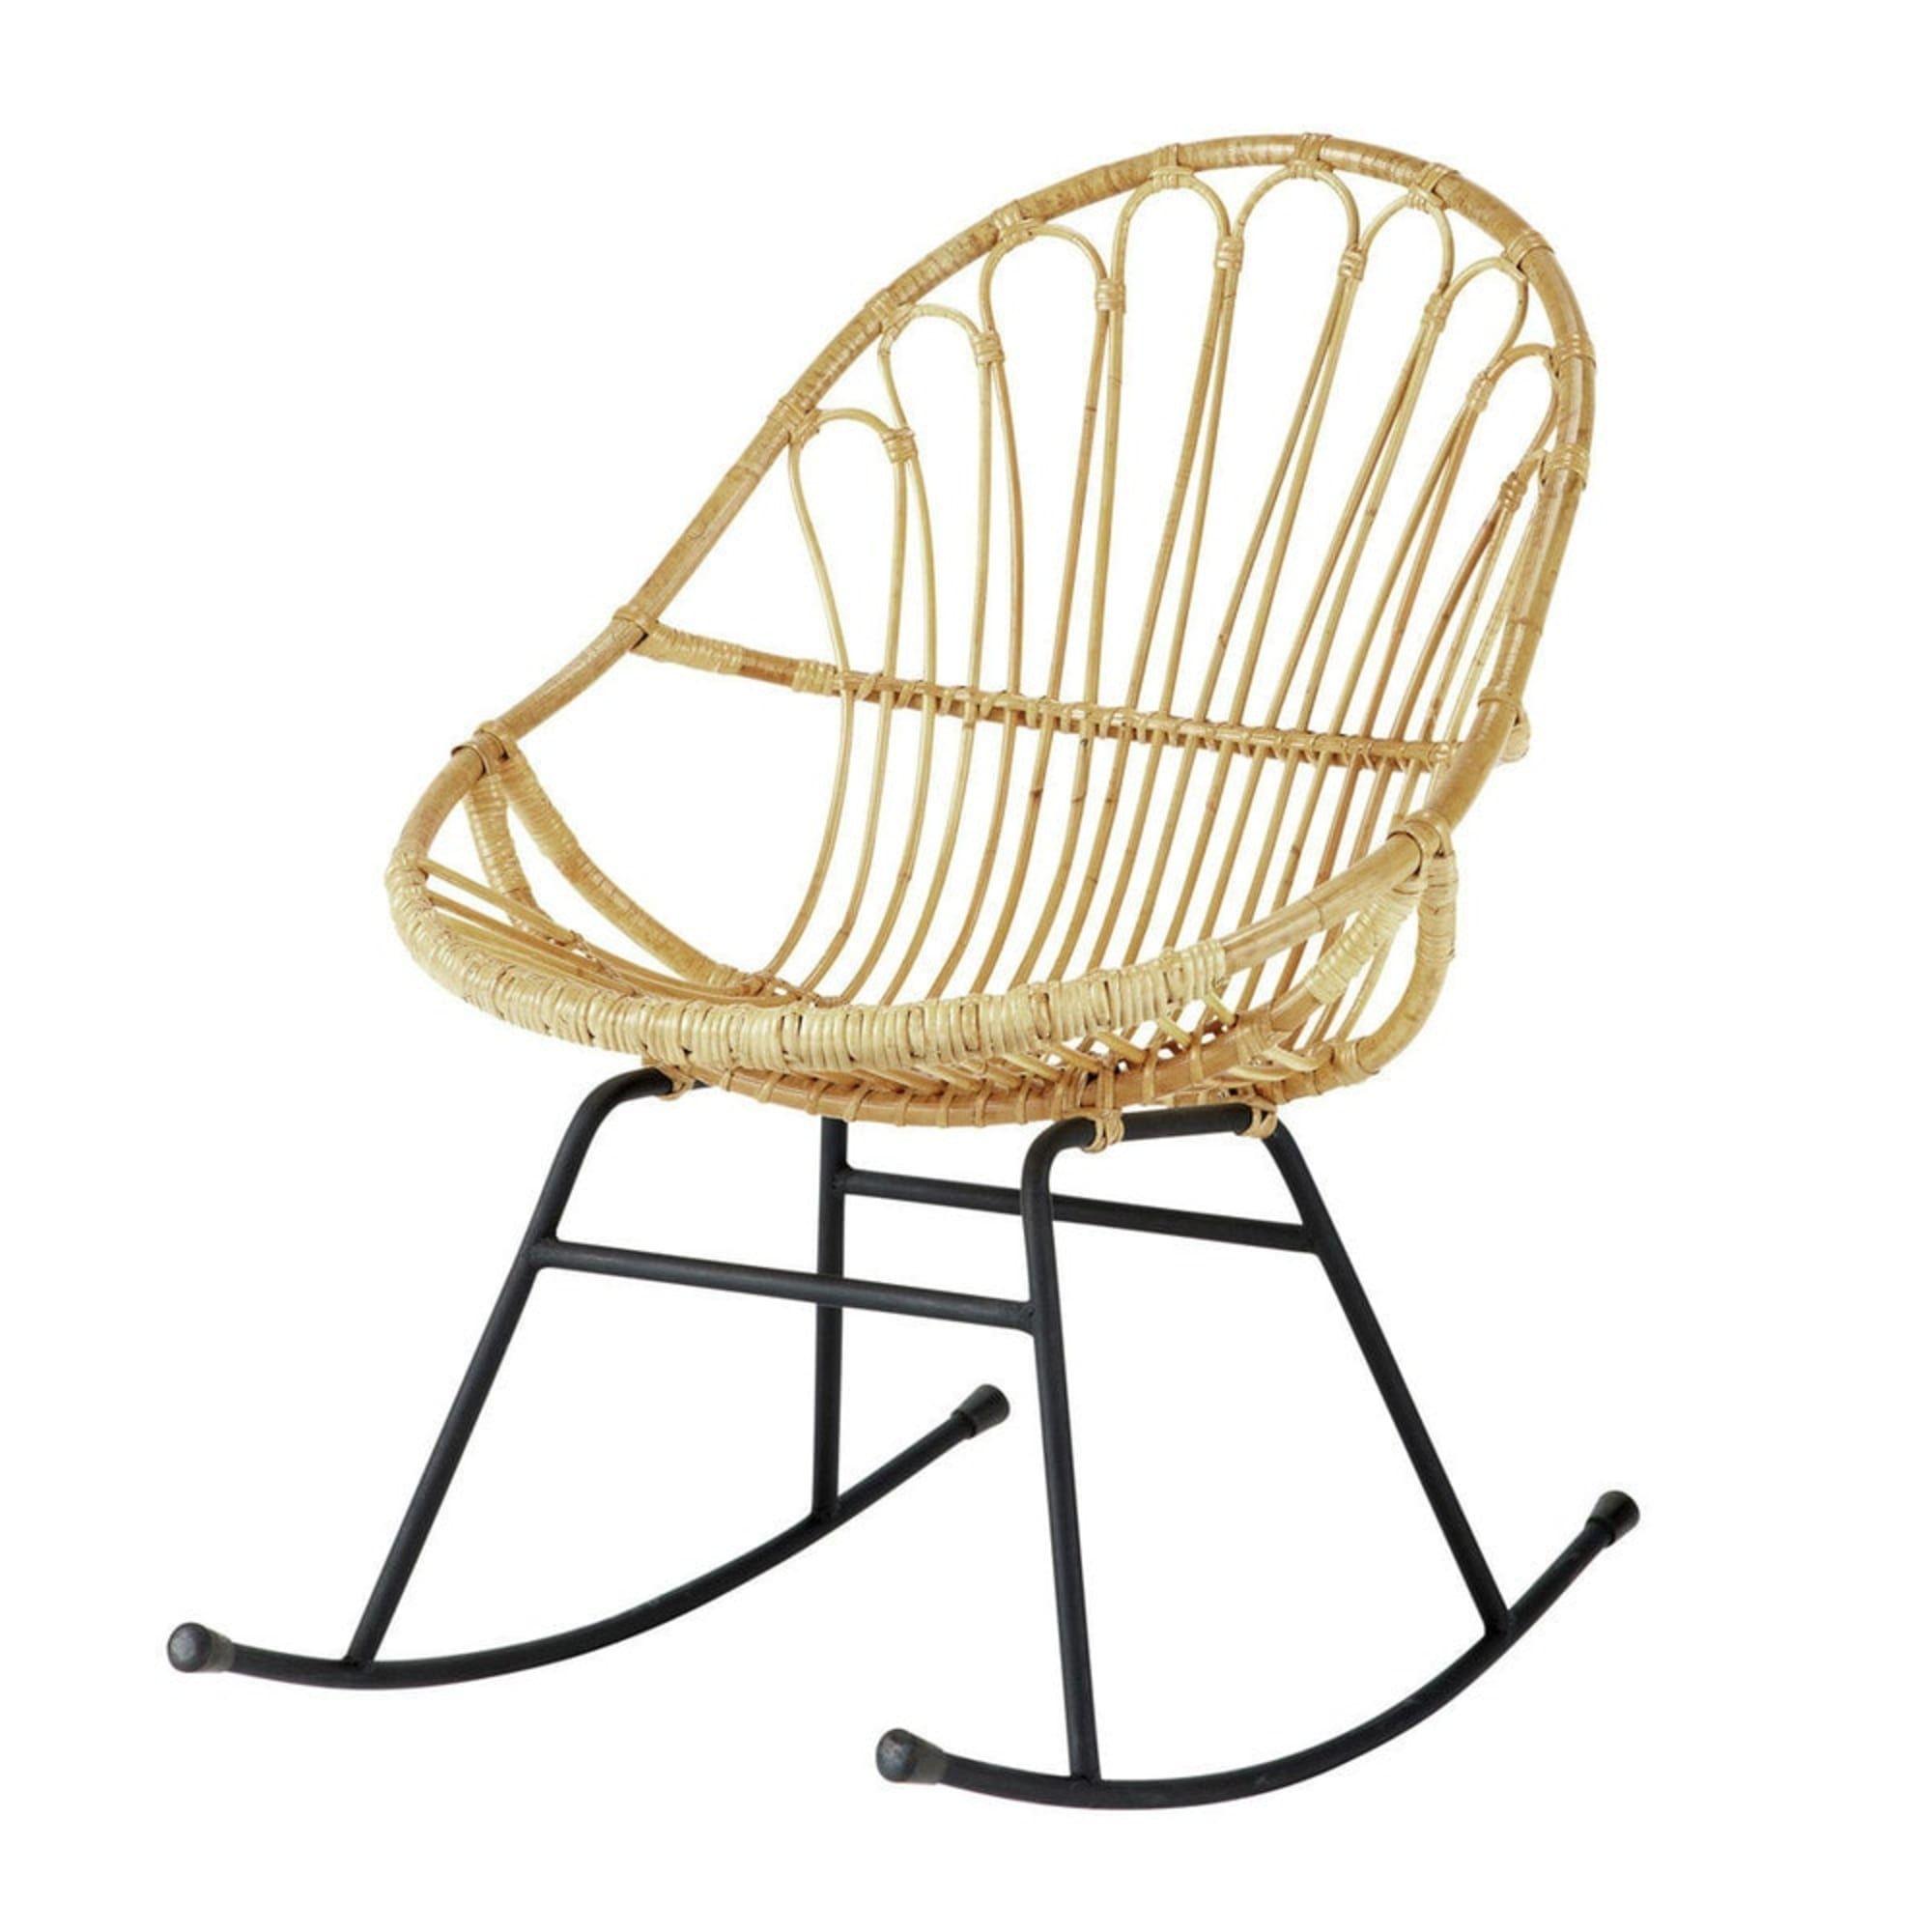 Fauteuil A Bascule En Rotin Petunia Maisons Du Monde Rattan Rocking Chair Rocking Chair Rocking Armchair